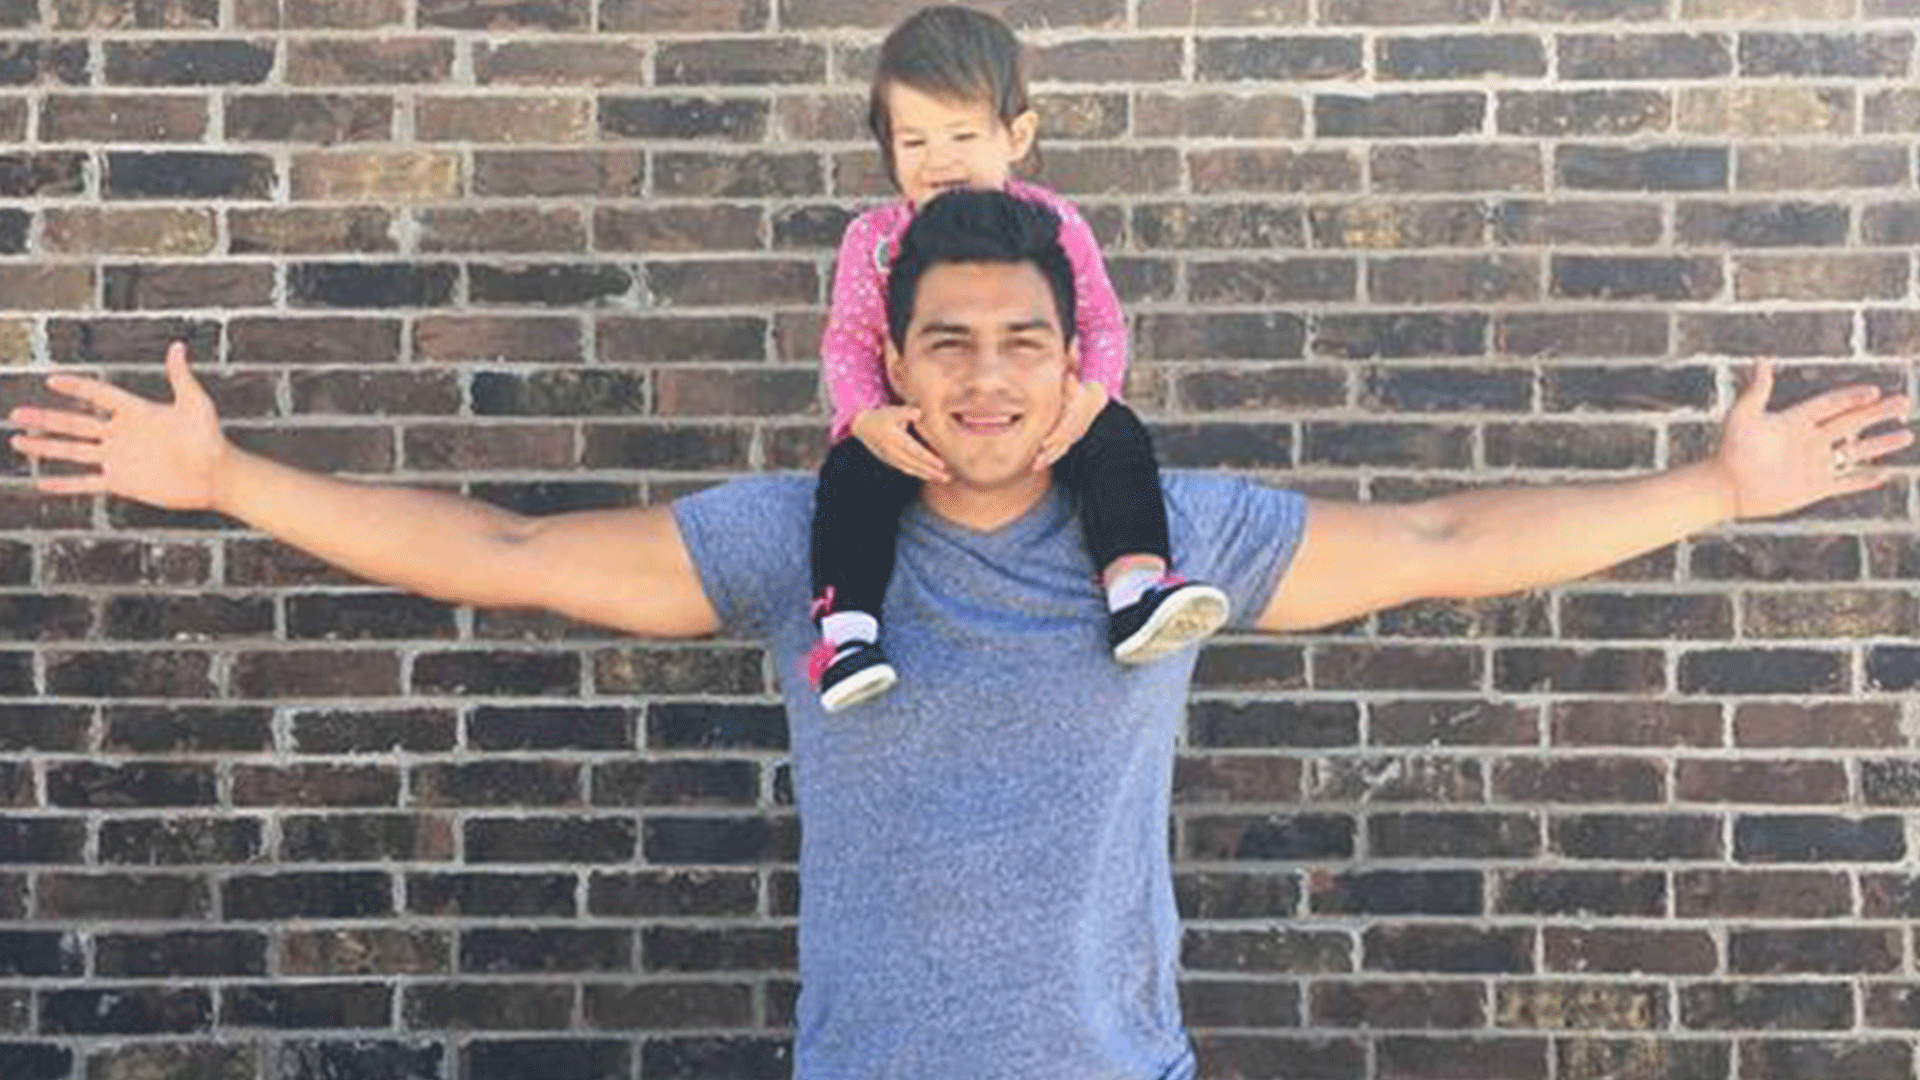 """Healthy manhood is being a present father."" — @vanessamartinez"